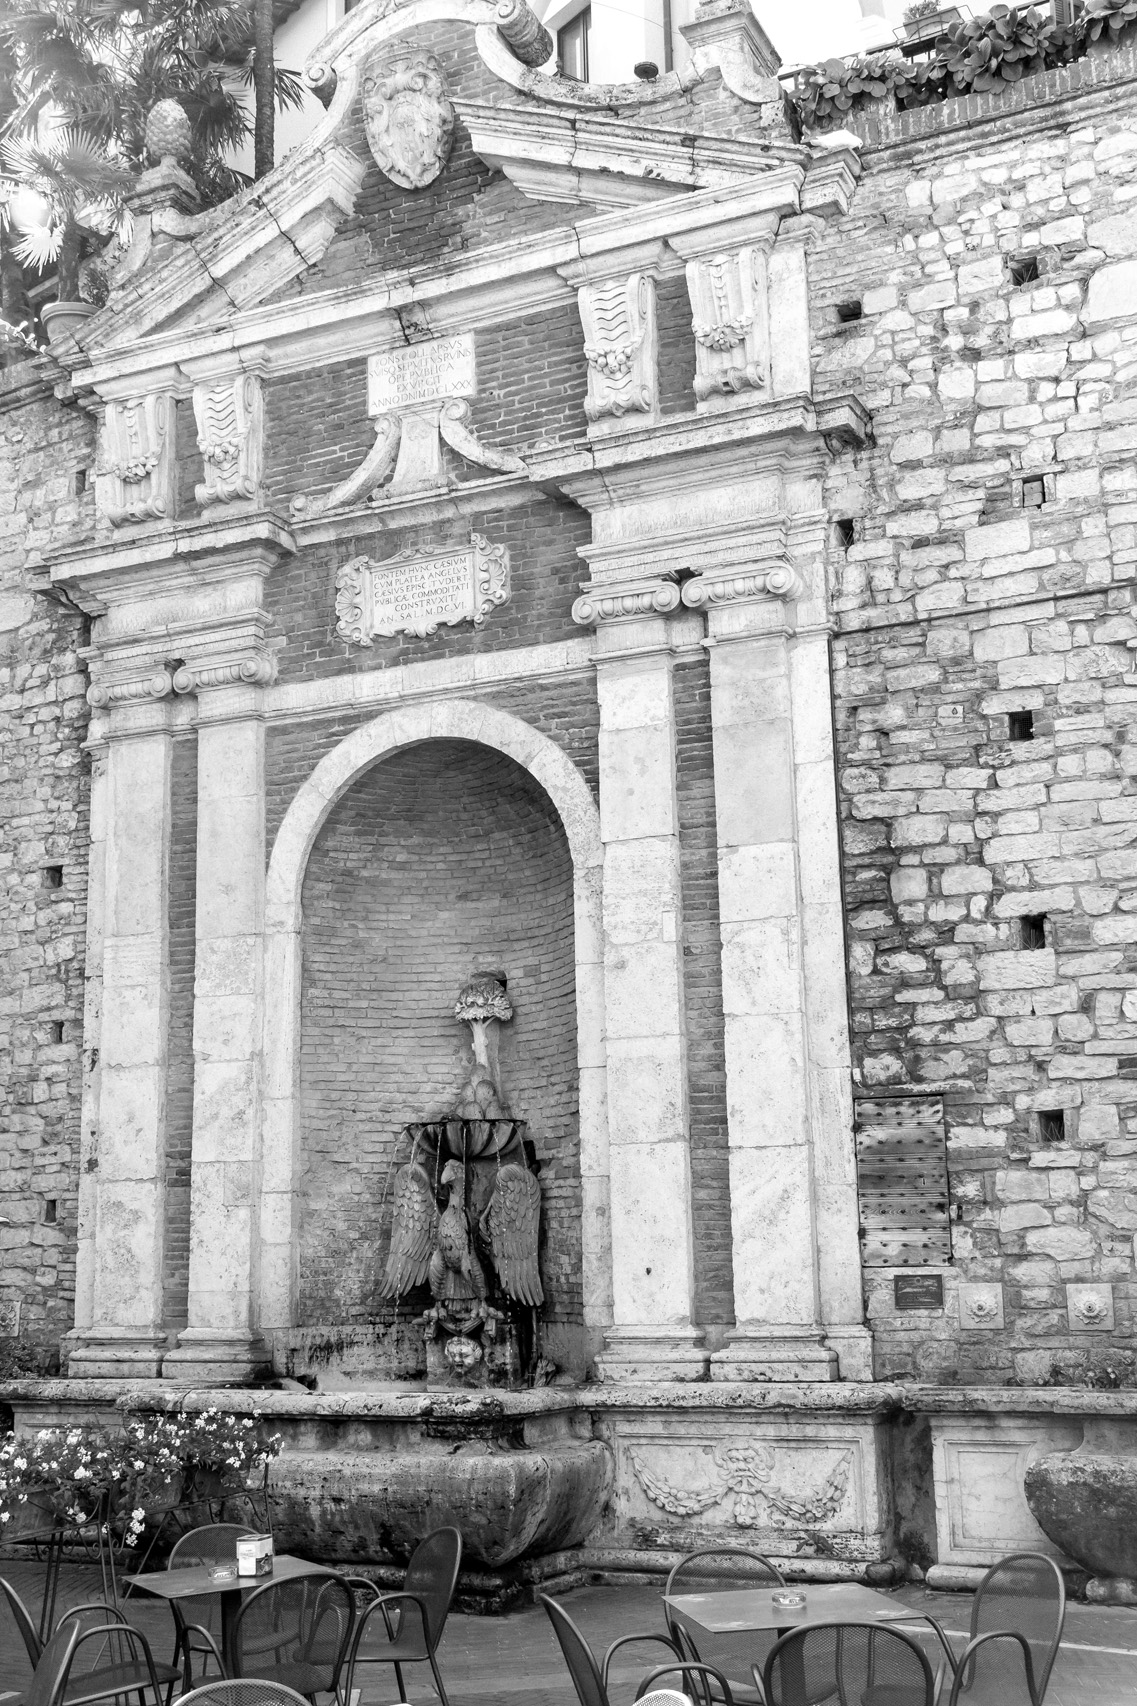 The town of Todi, Umbria